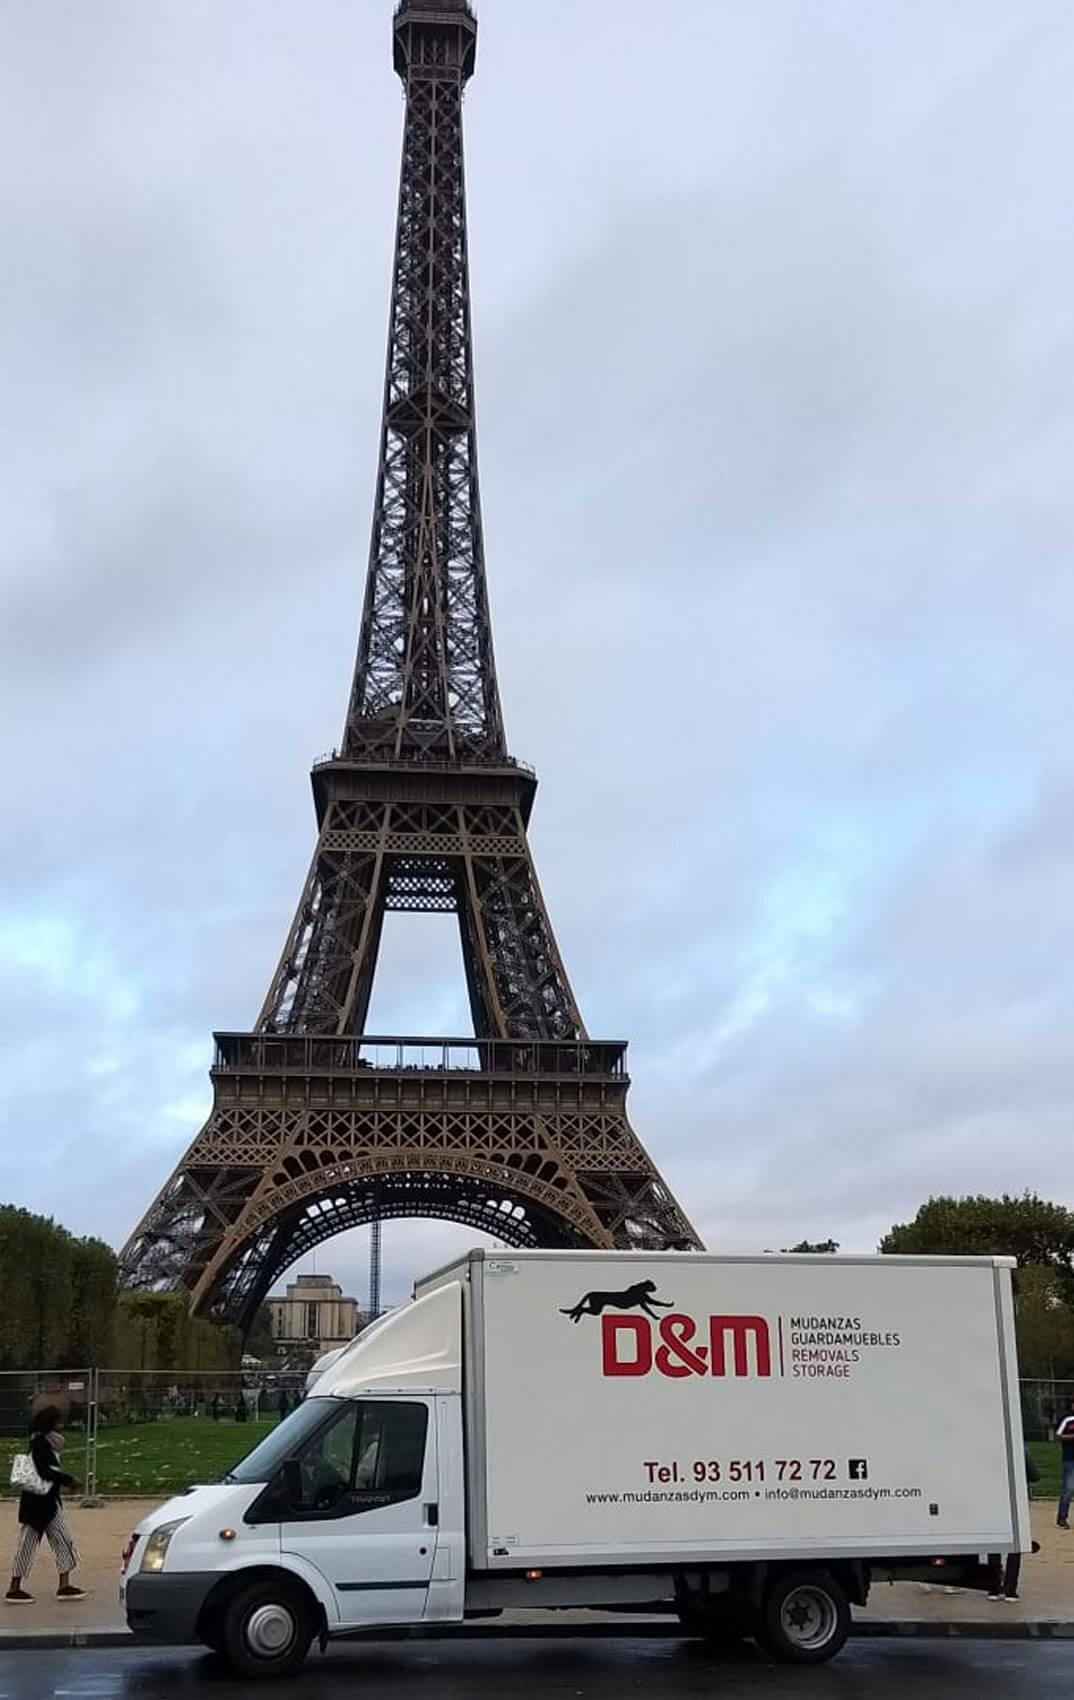 Mudanzas D&M en Paris